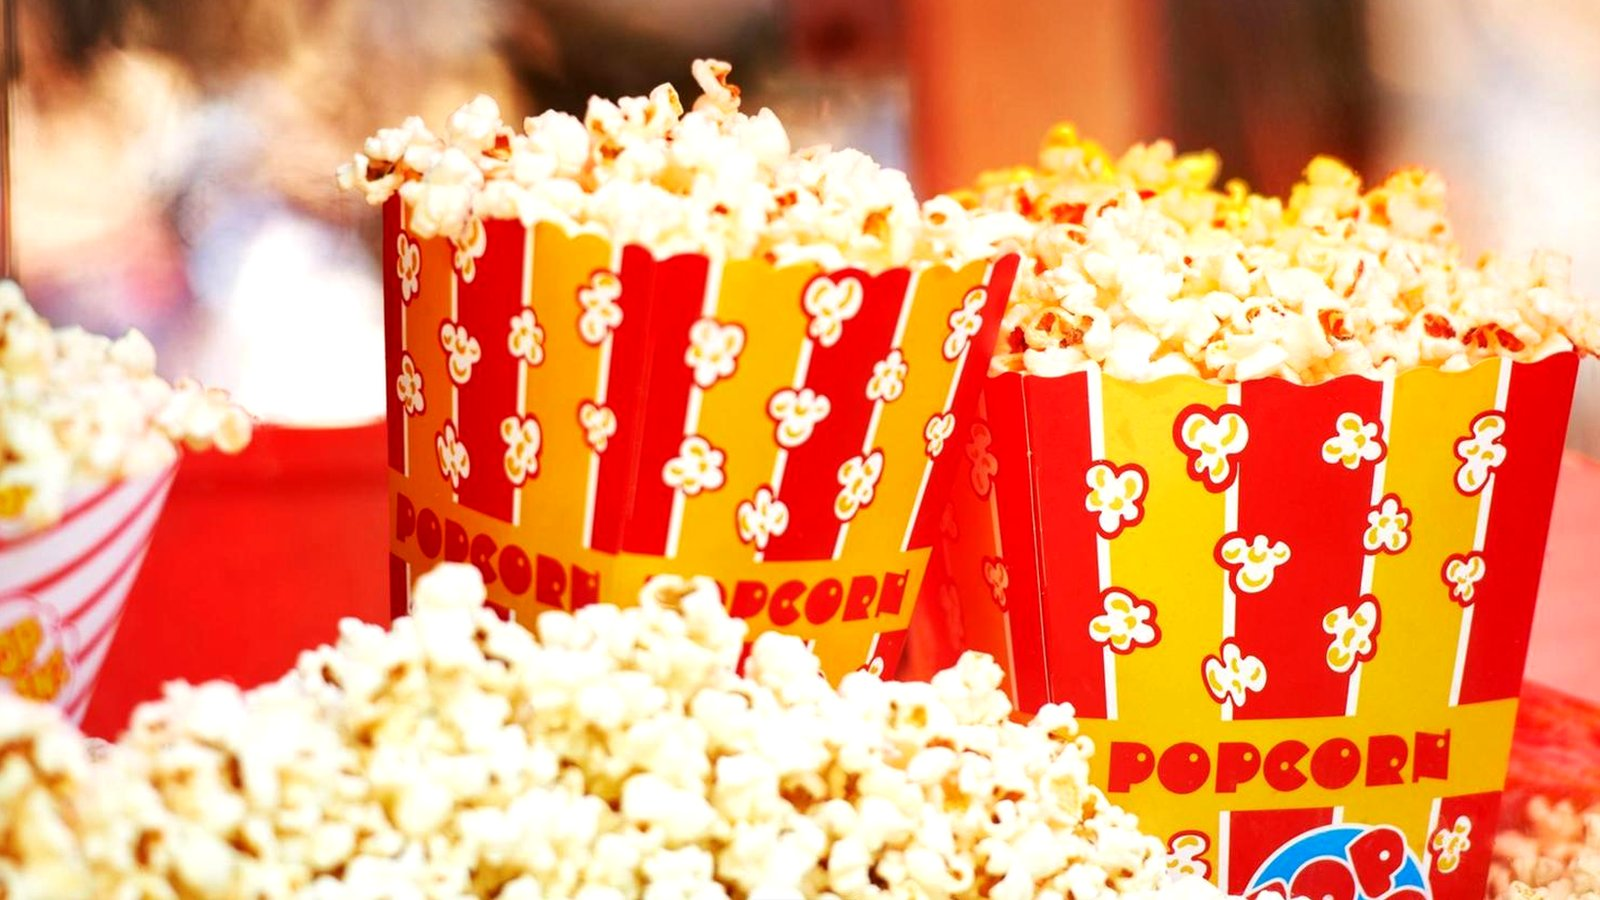 _95341762_popcorn4.jpg